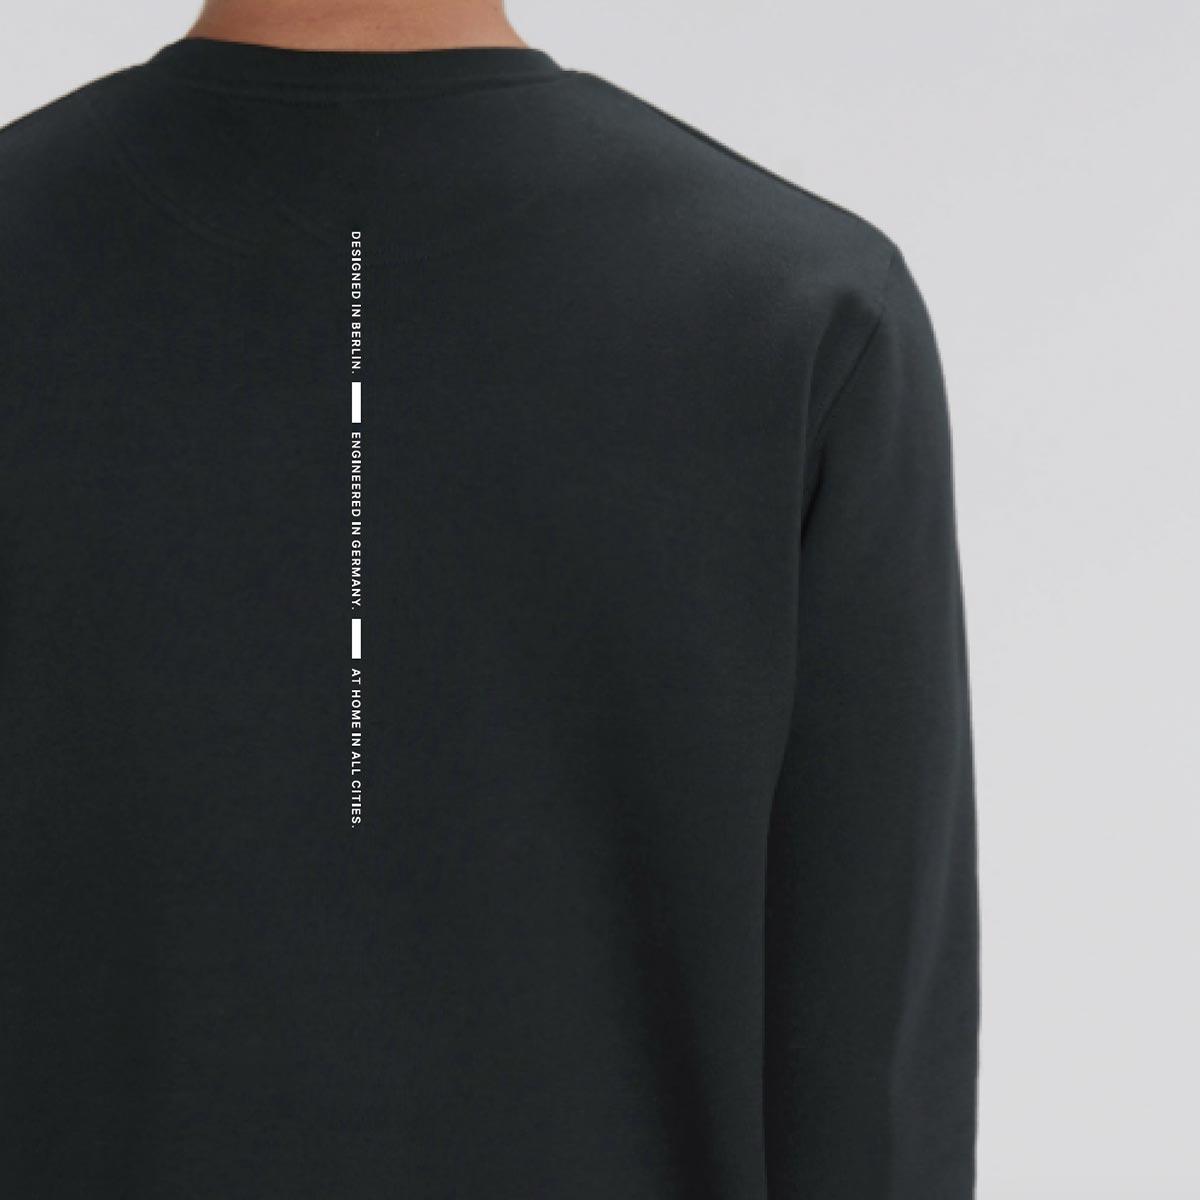 Black branded organic sweaters for Unu Motors